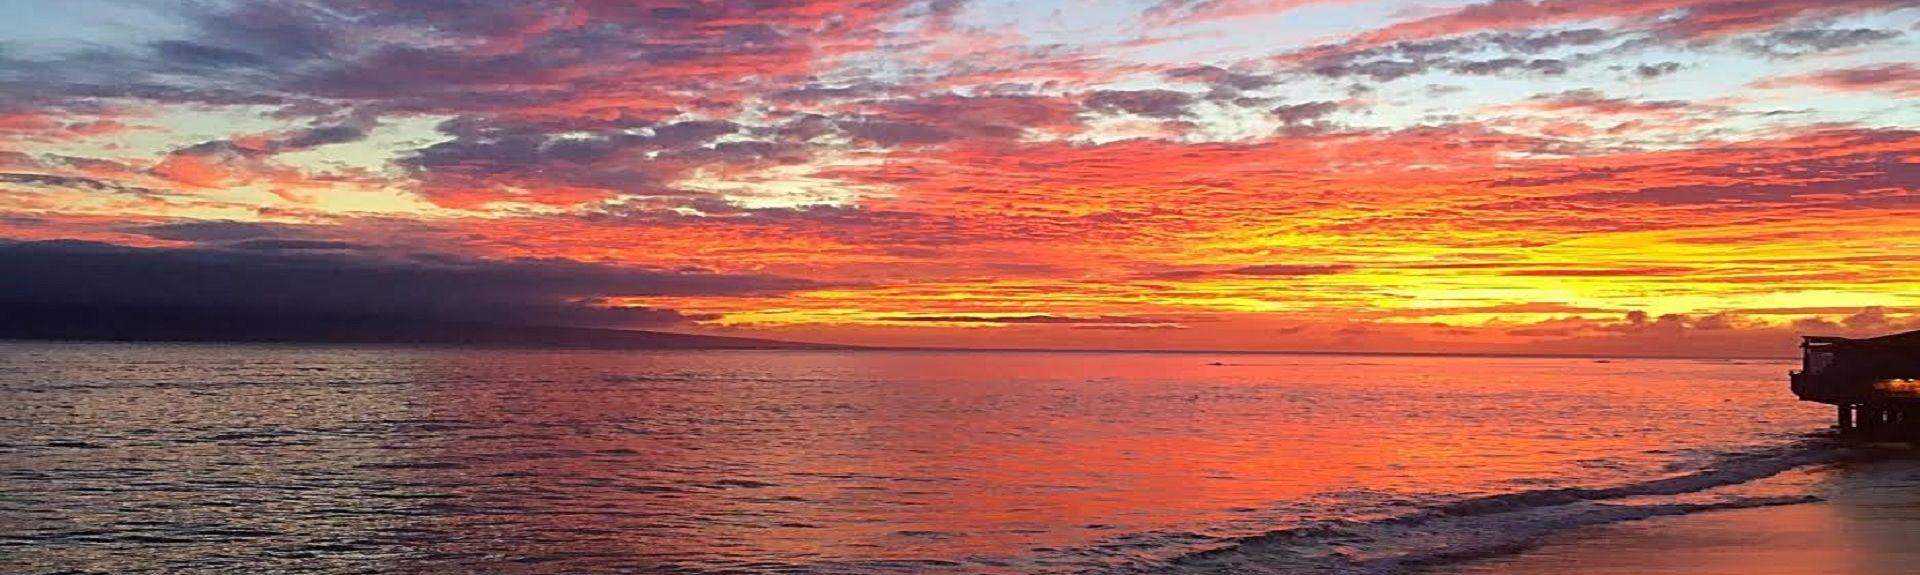 Aina Nalu (Lahaina, Hawaii, United States)